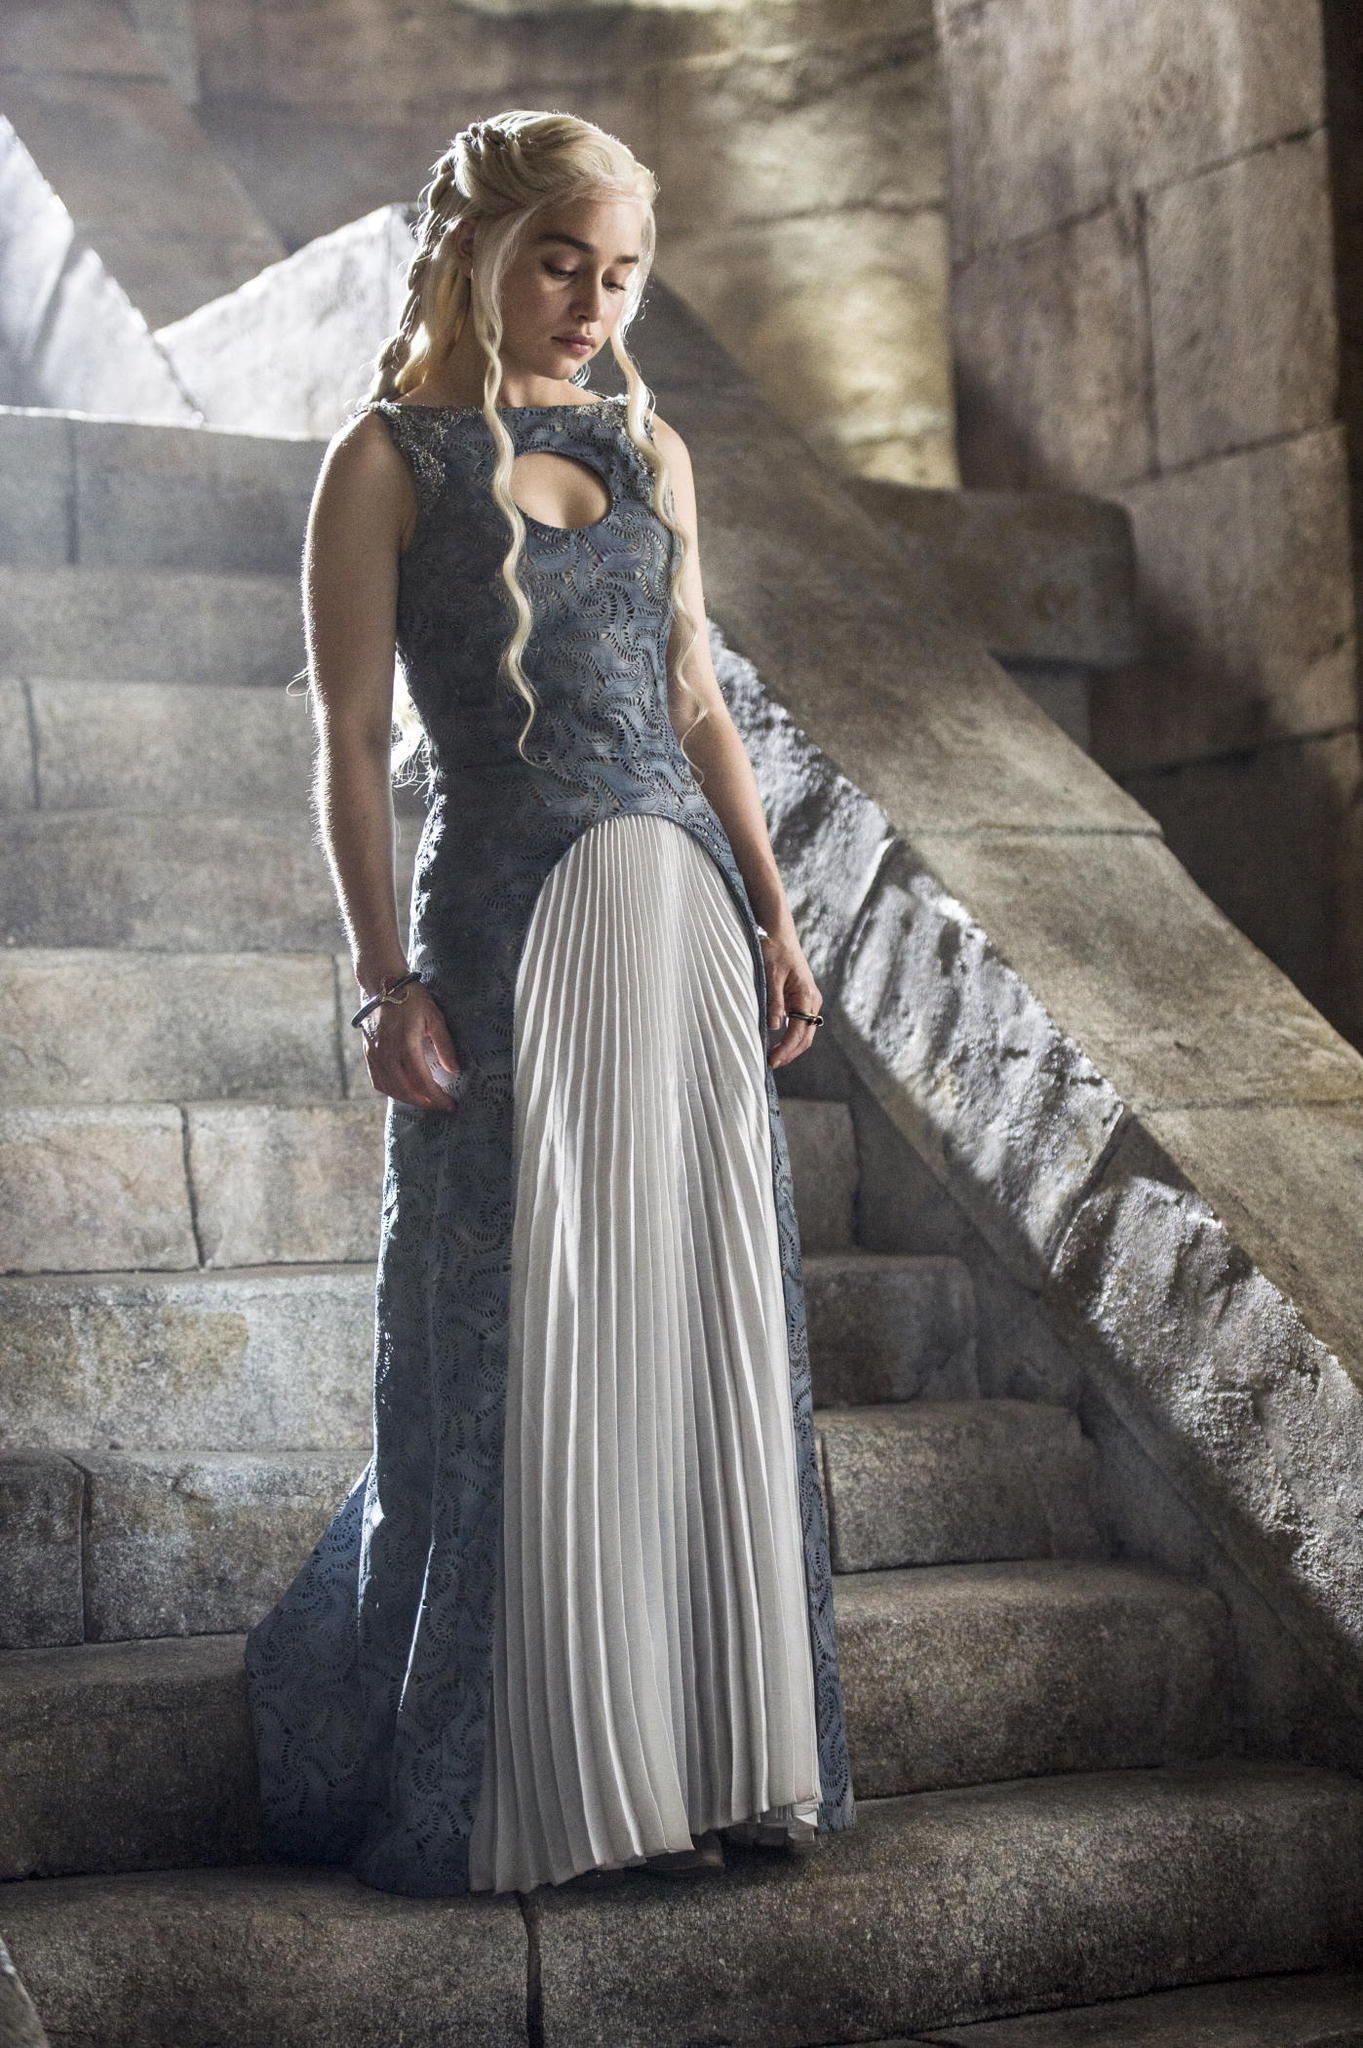 Daenerys Targaryen Season 5 Promo